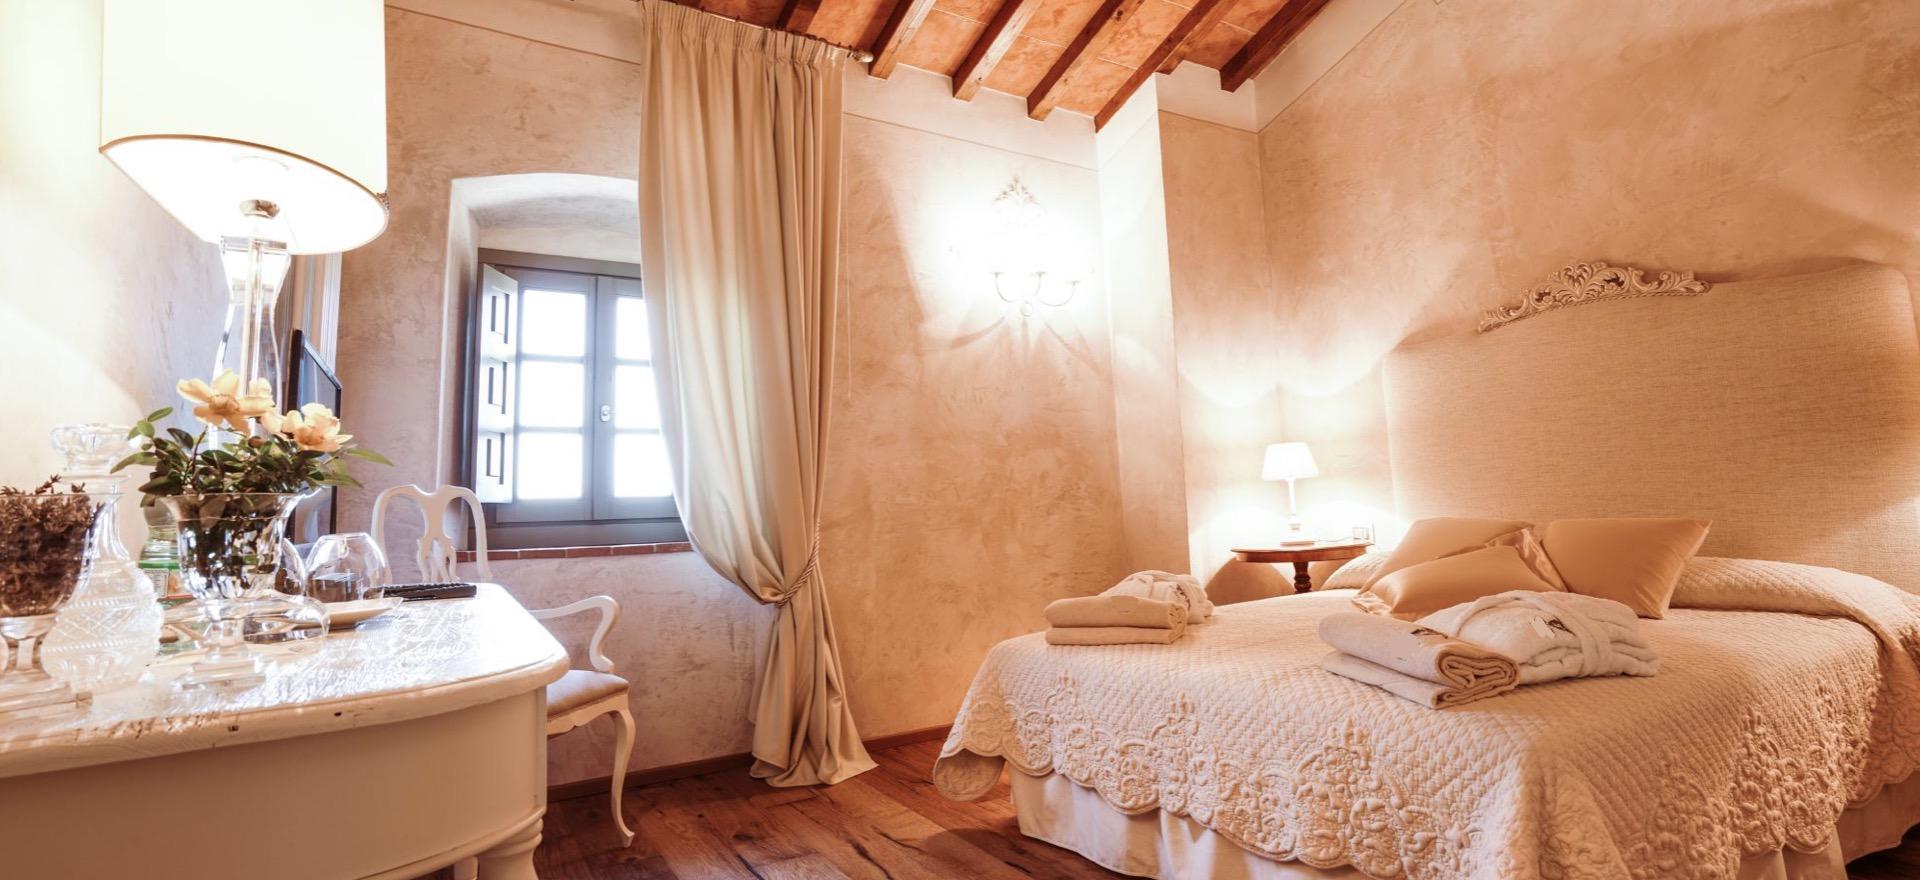 Boutique B&B in elegante villa in Toscane